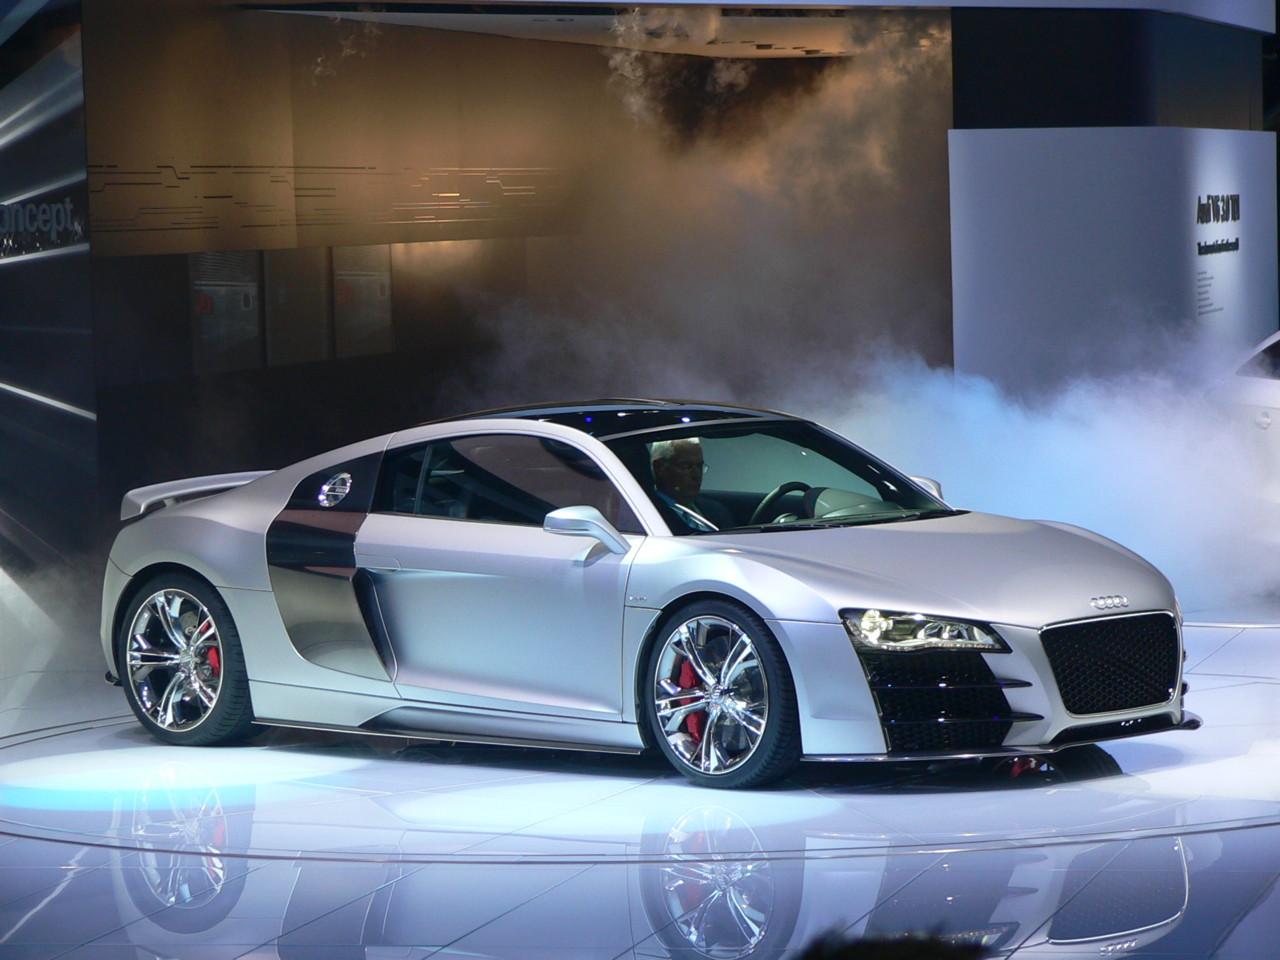 Kelebihan Kekurangan Audi R8 Diesel Spesifikasi